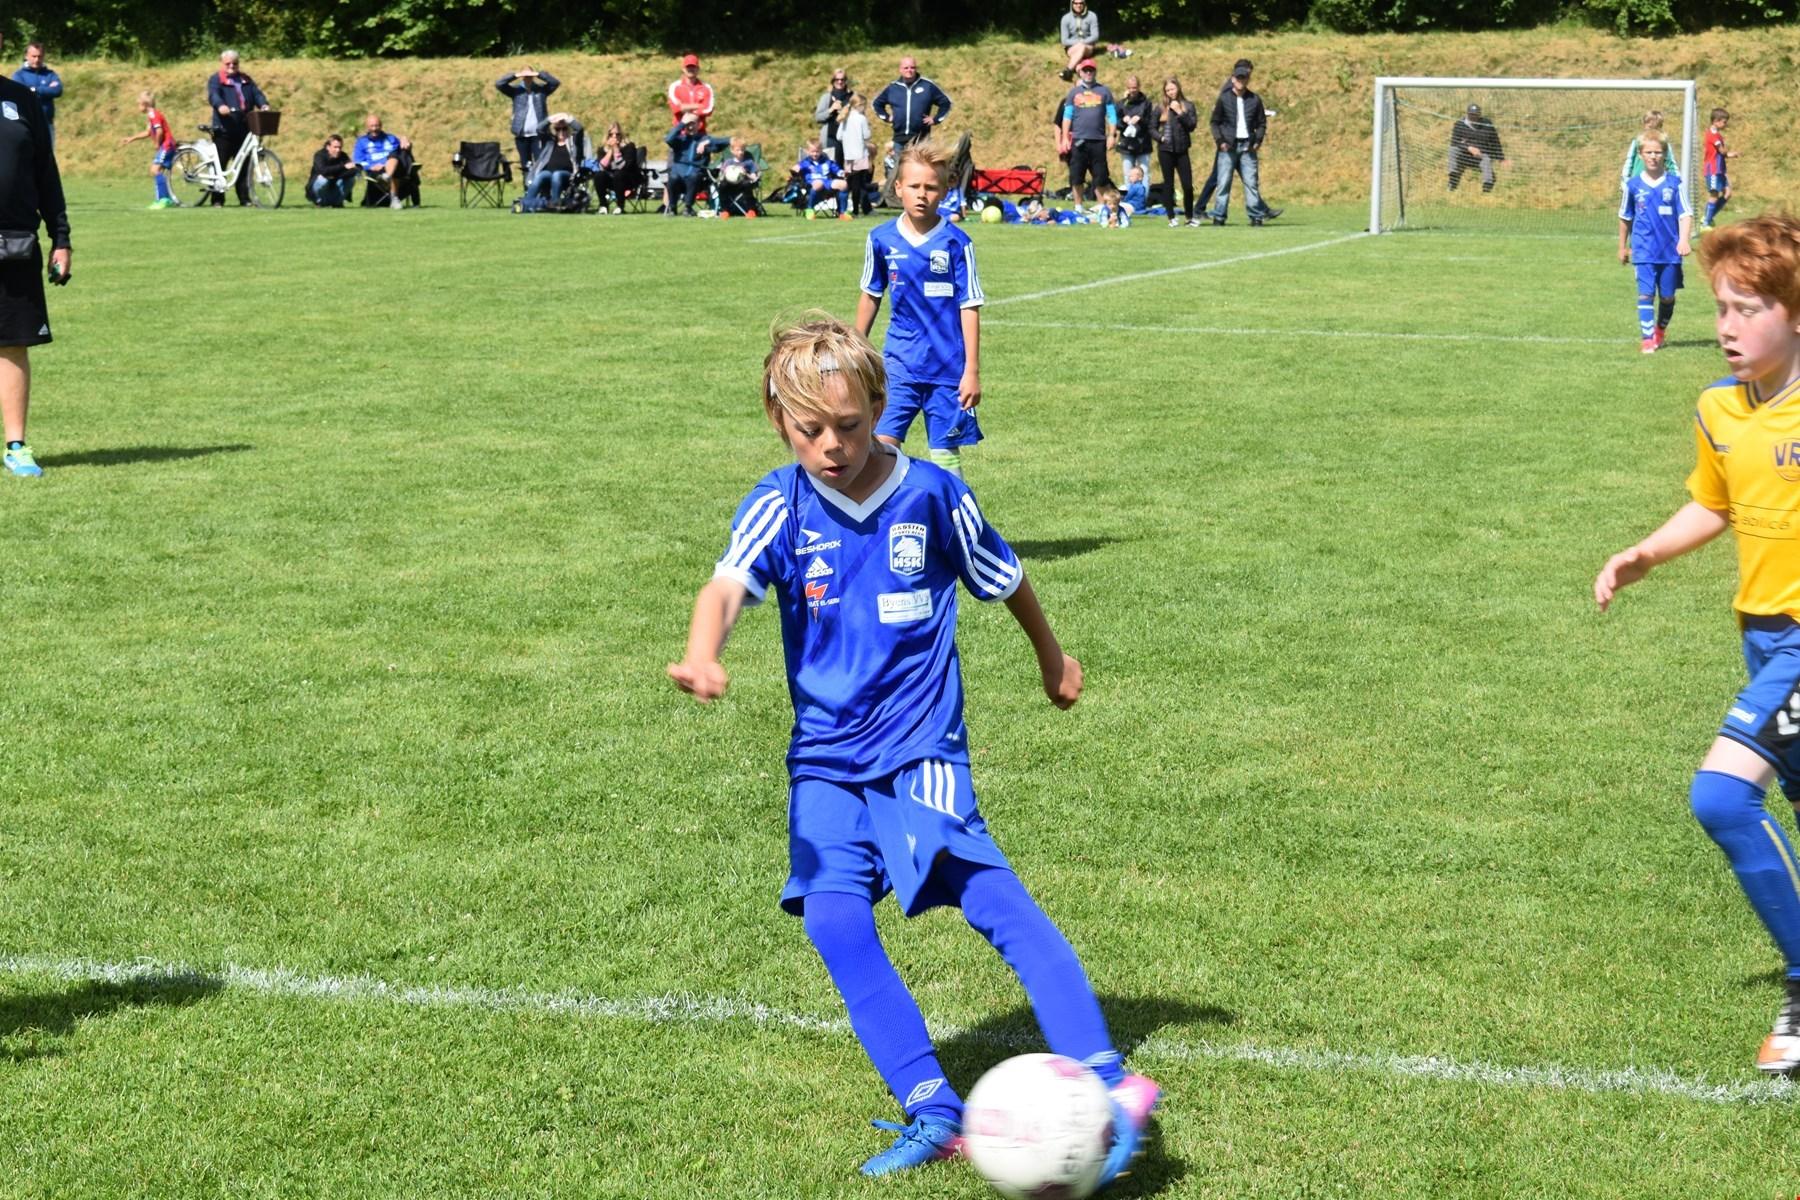 Fodbold for begyndere